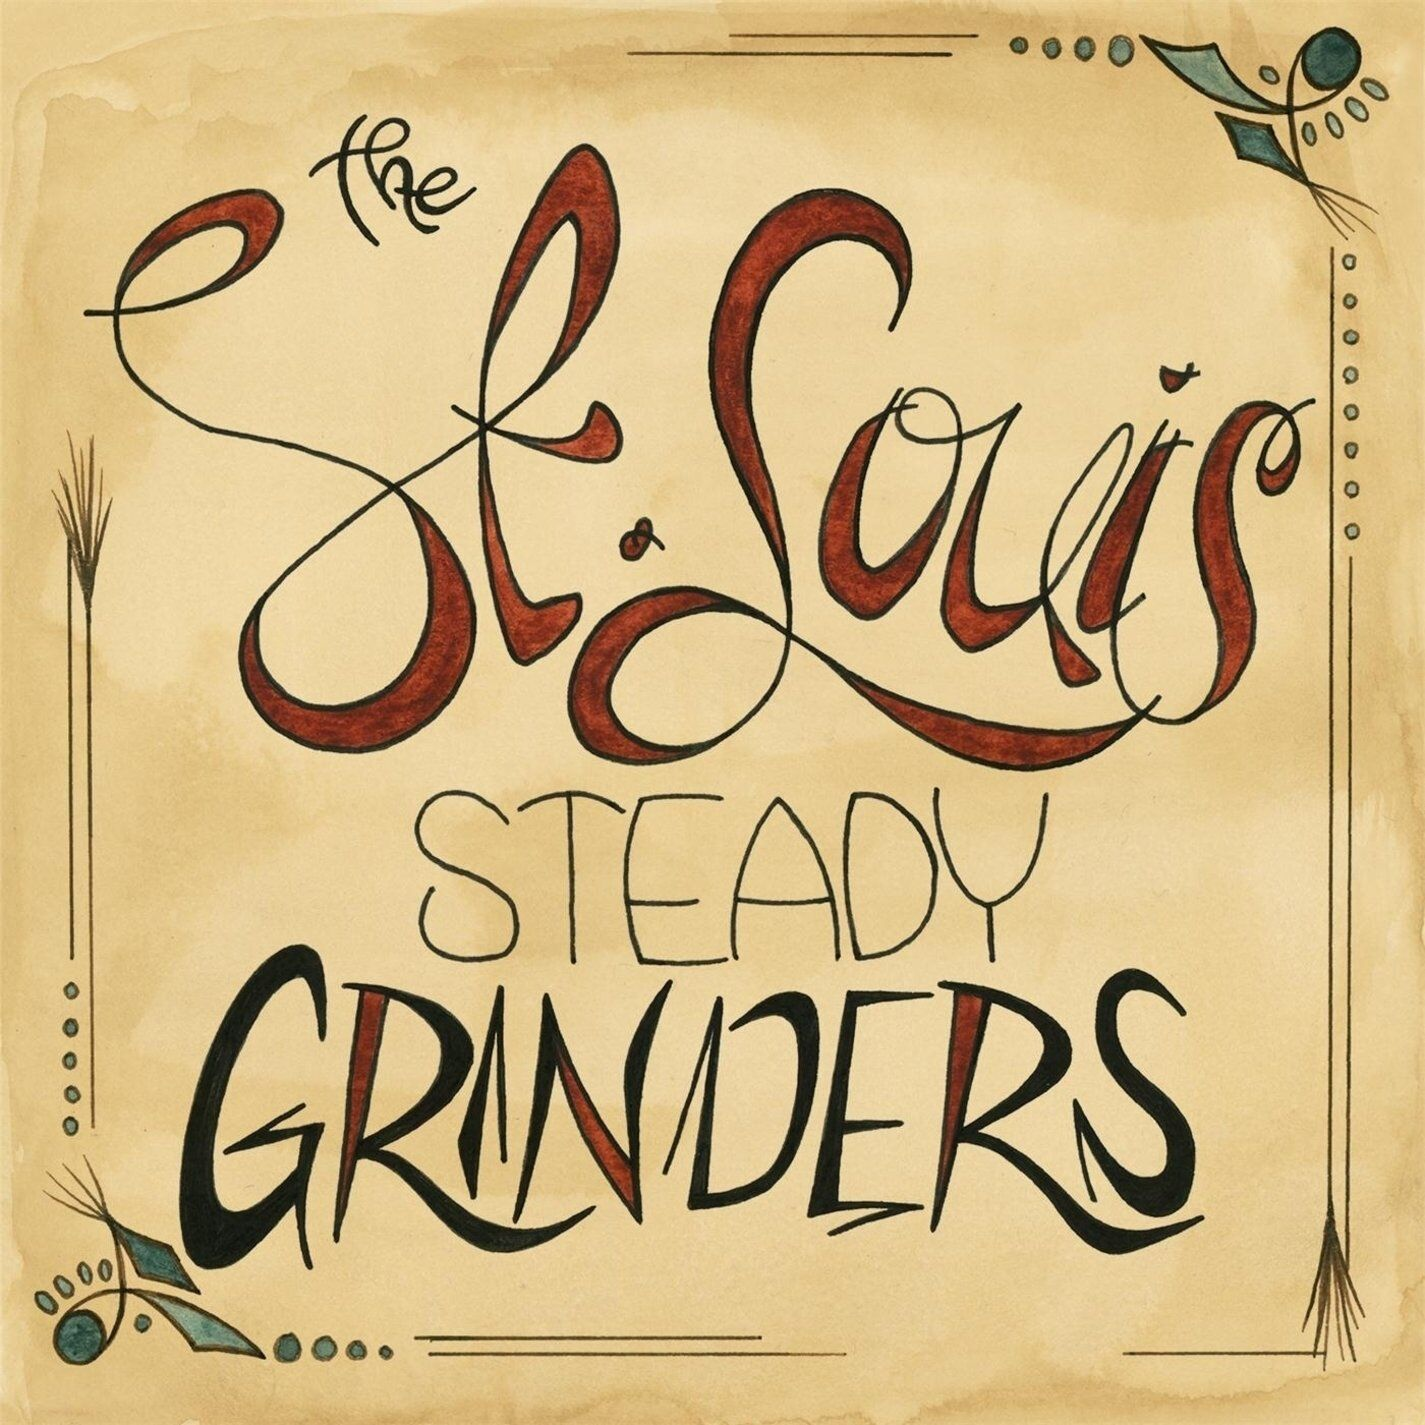 St. Louis Steady Grinders Album